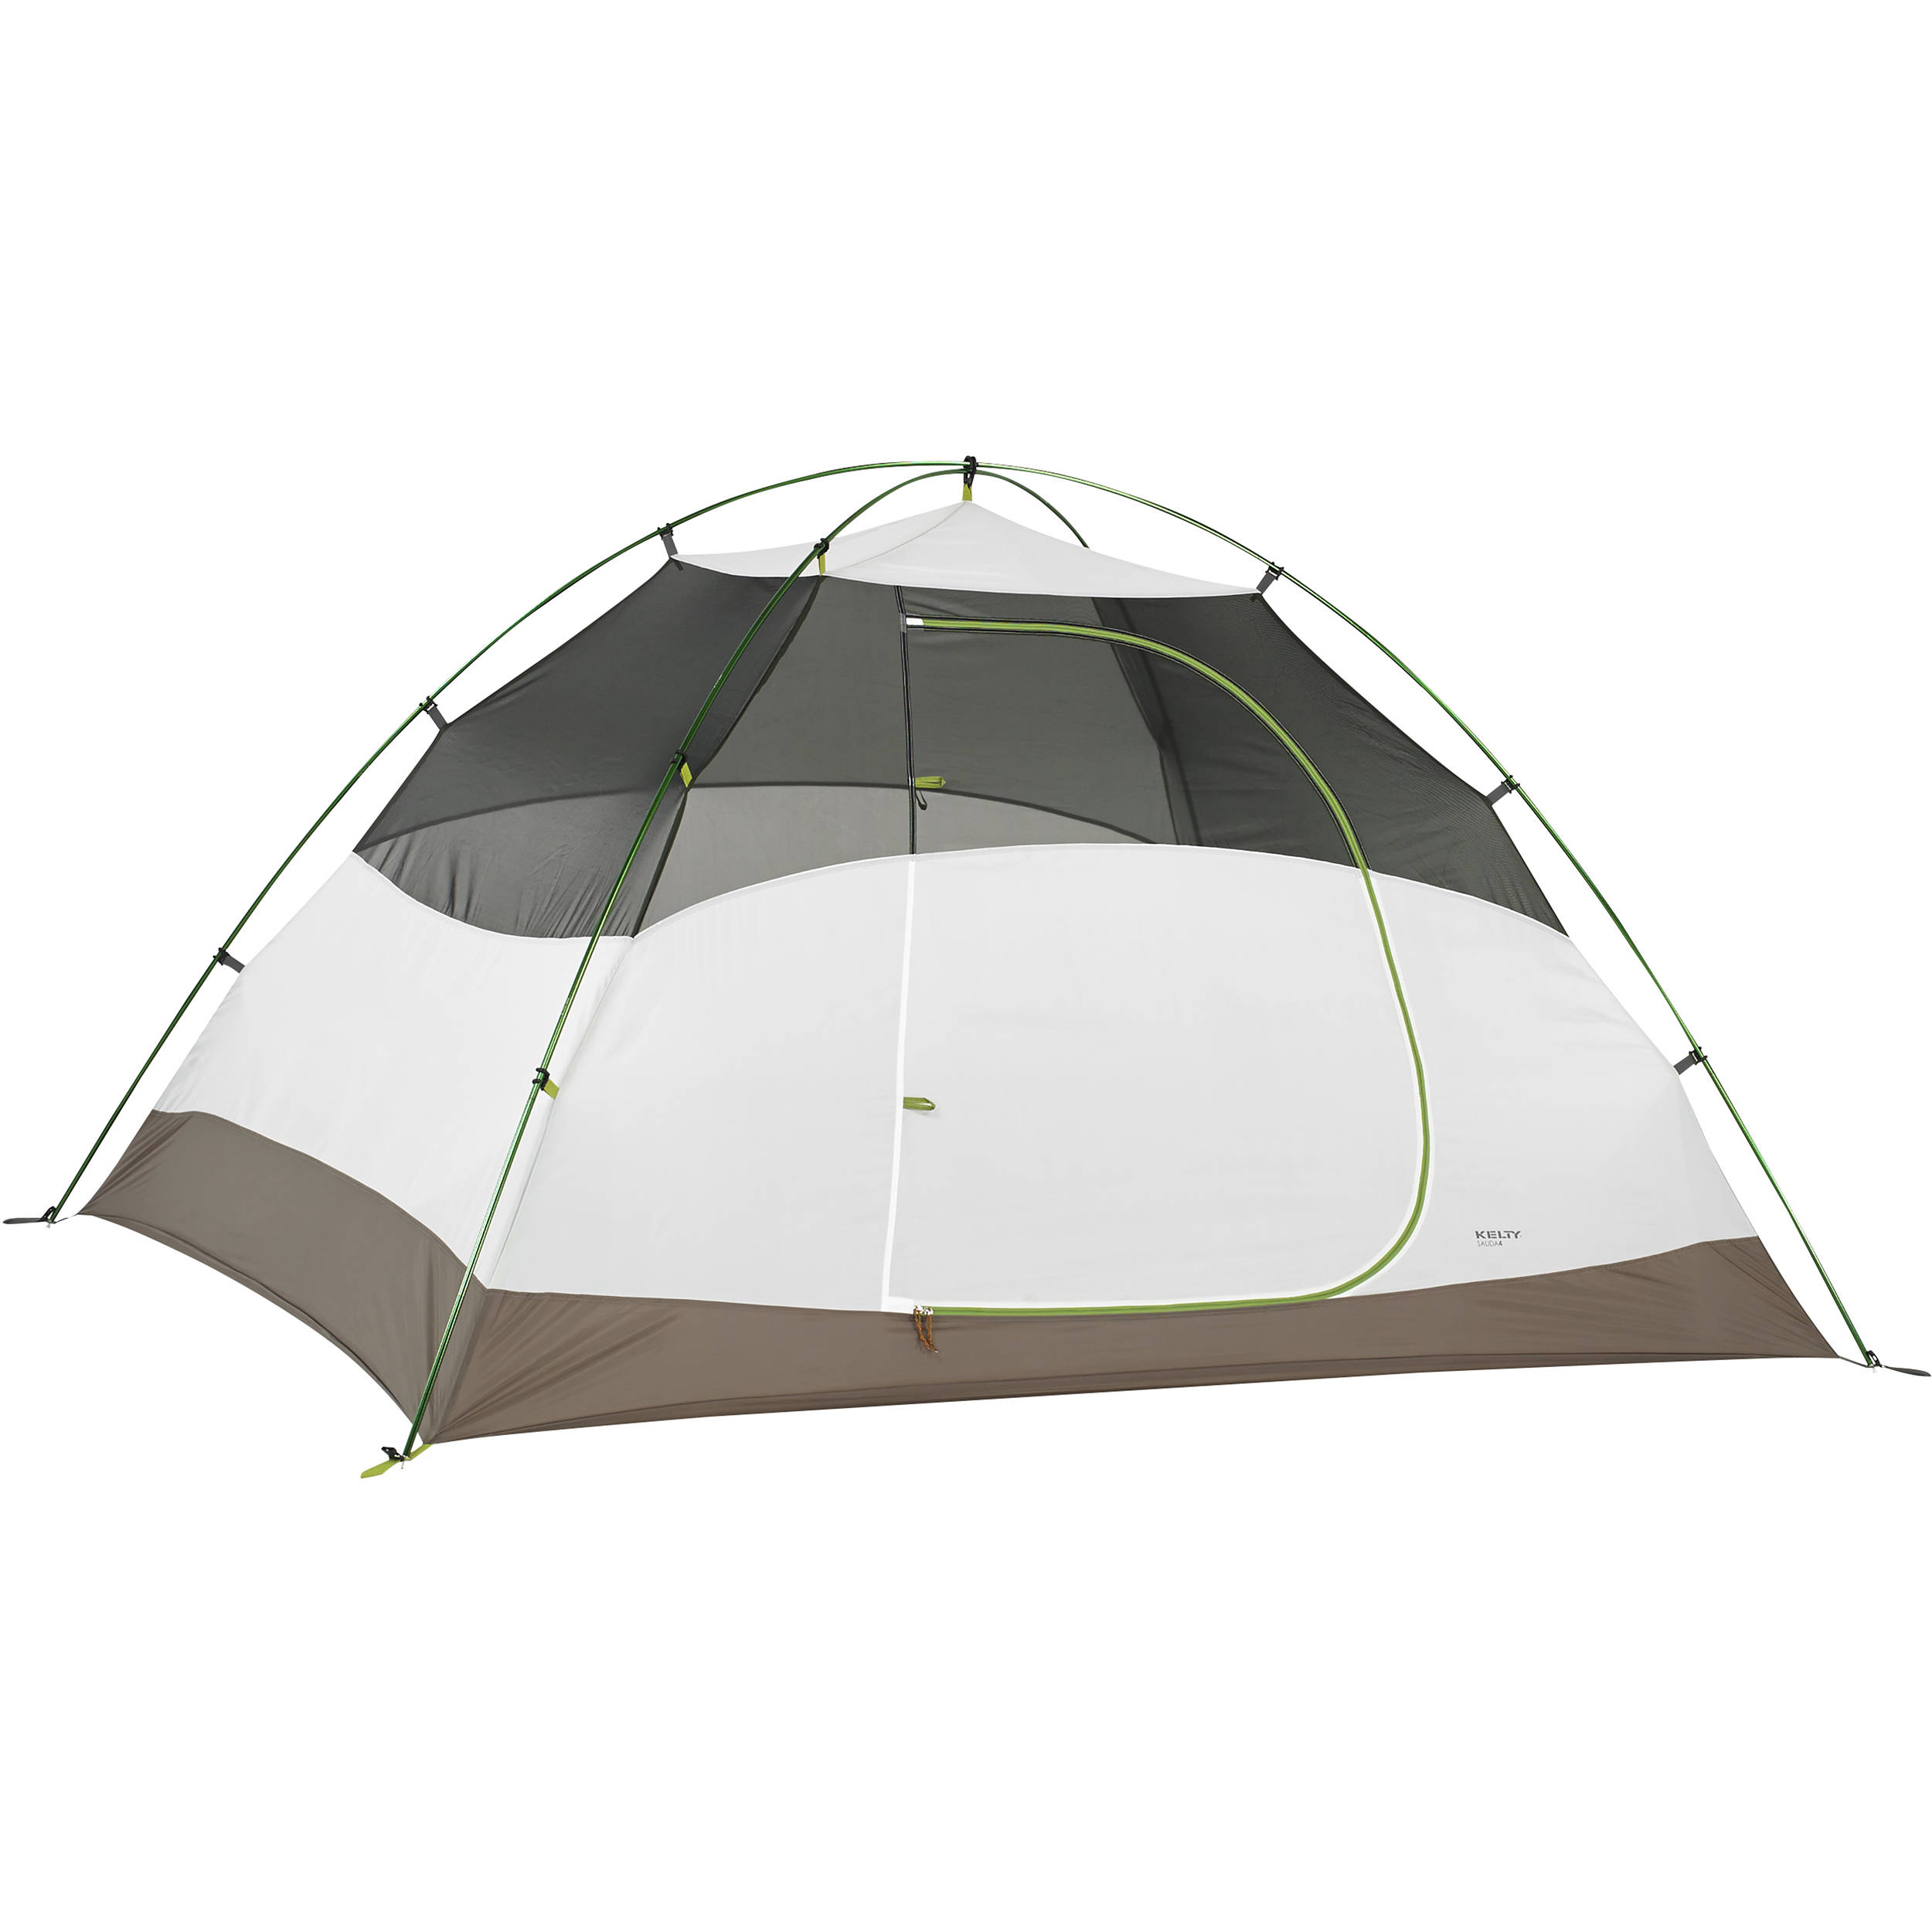 Kelty Salida 4 Tent  sc 1 st  Bu0026H & Kelty Salida 4 Tent 40812415 Bu0026H Photo Video